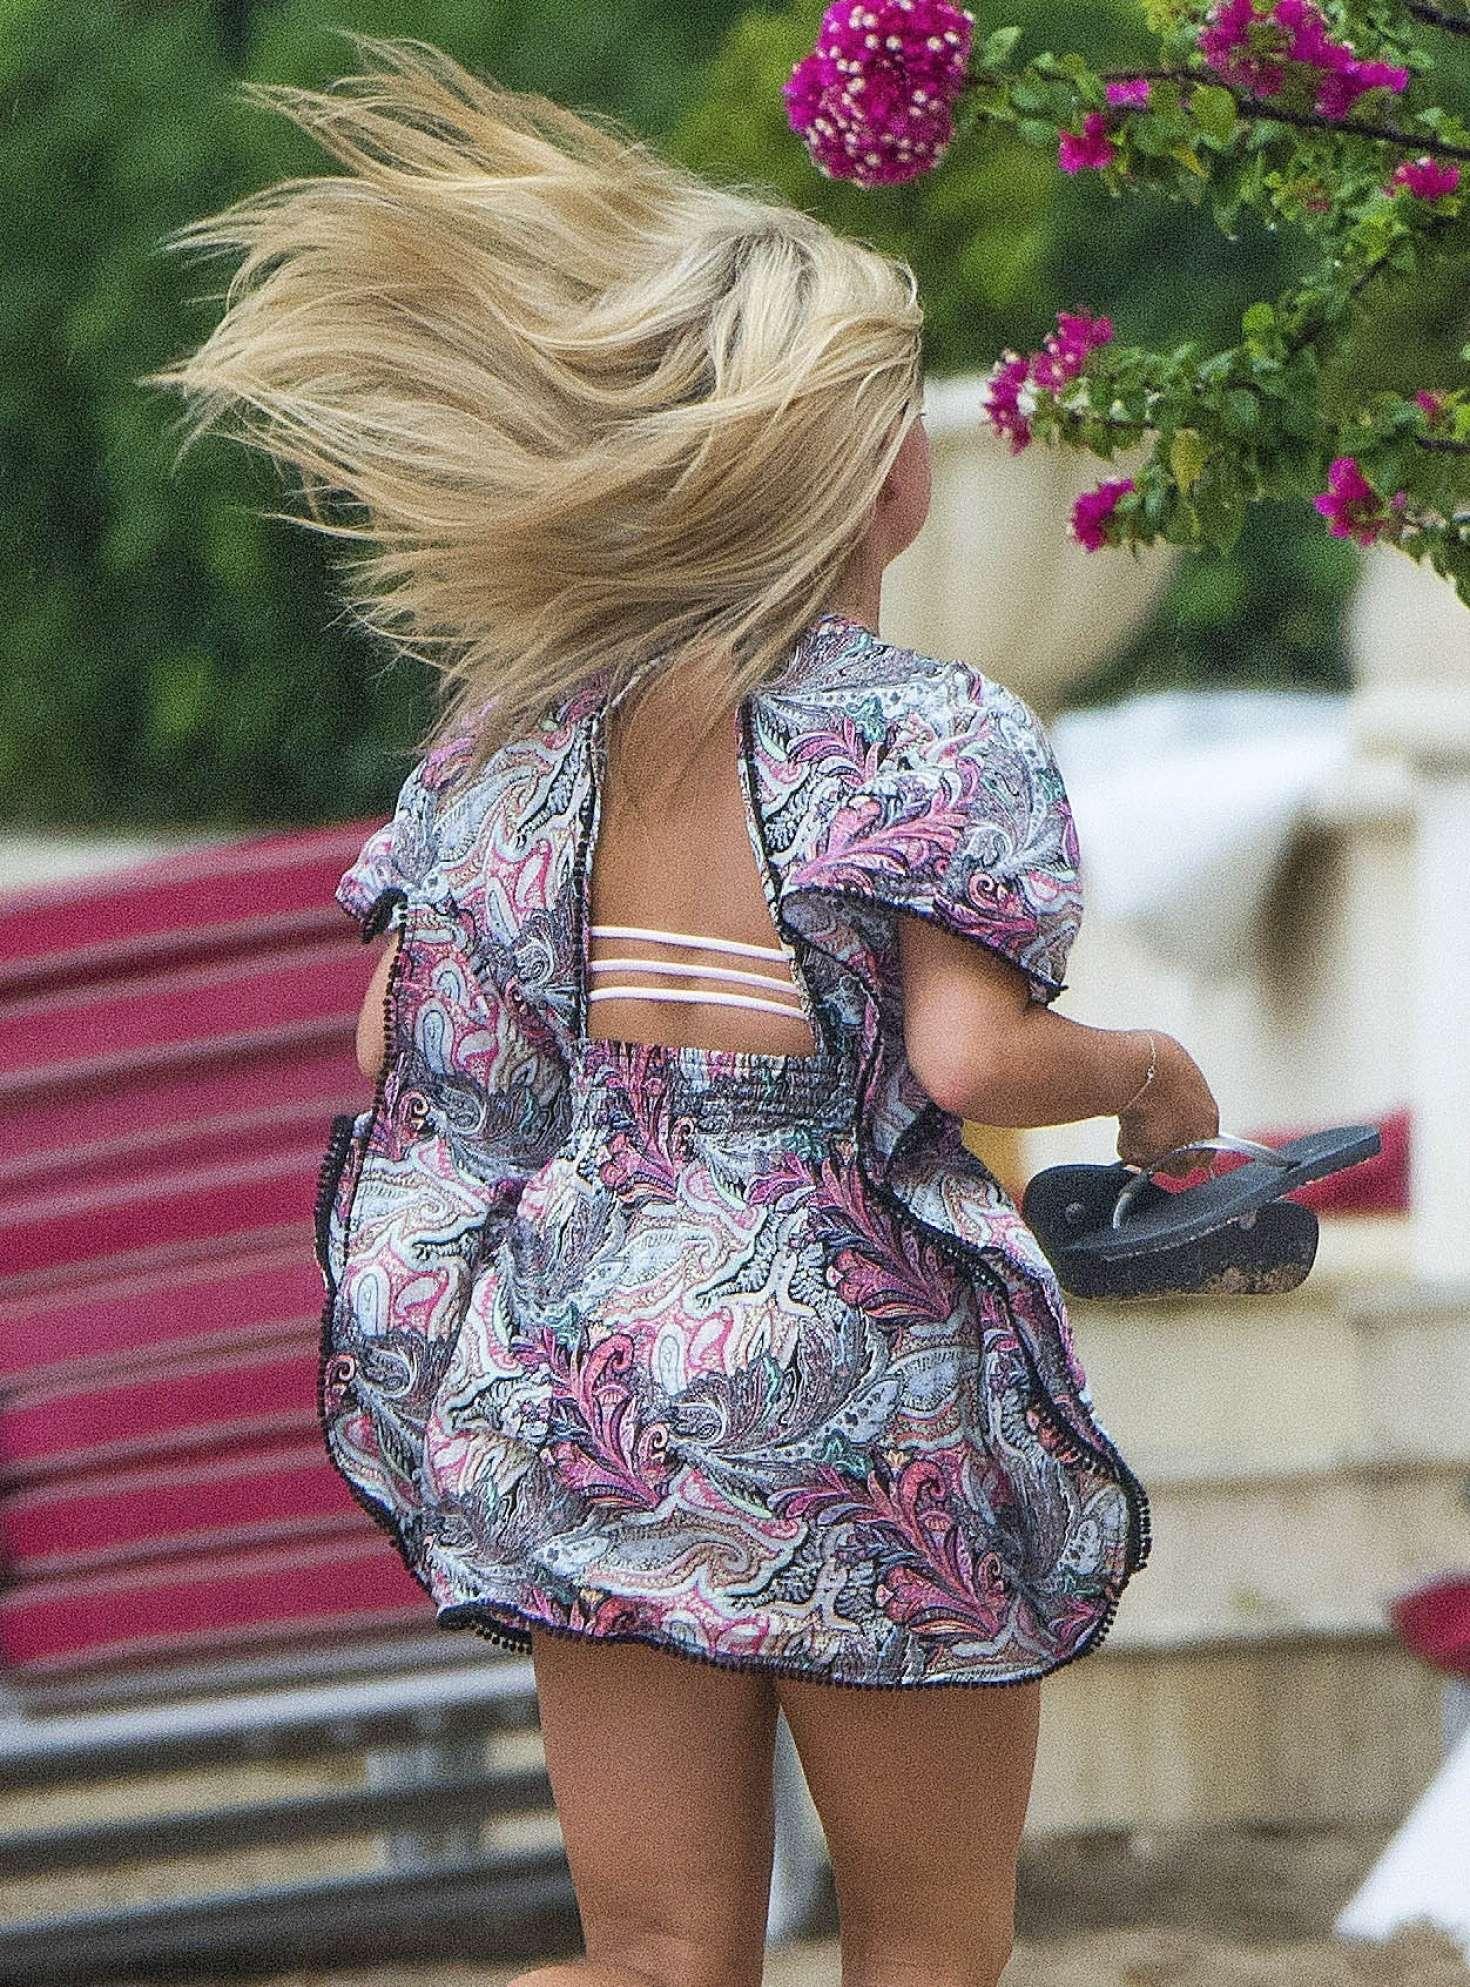 Zara Holland On Holiday In Barbados -12